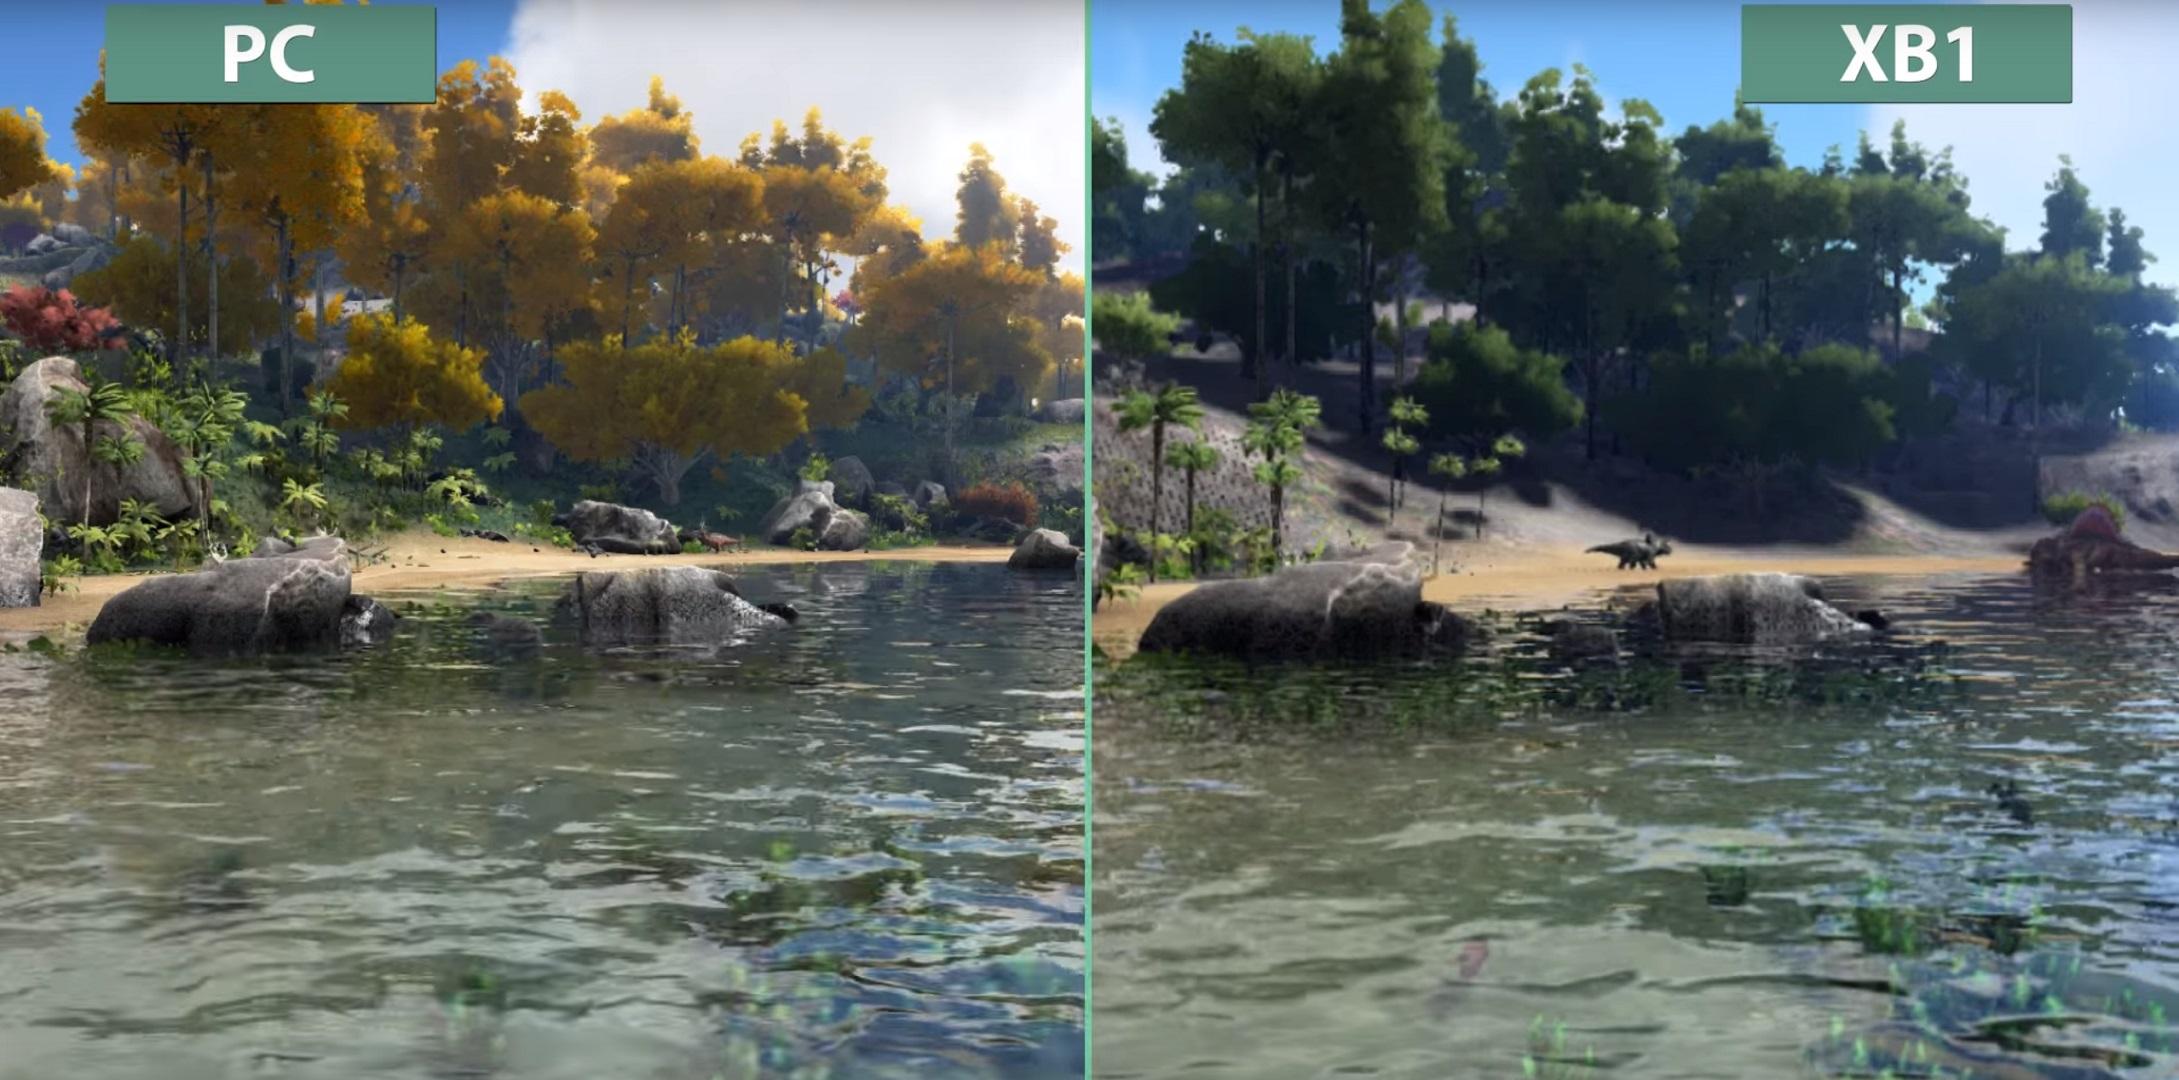 ark survival evolved pc vs xbox one graphics